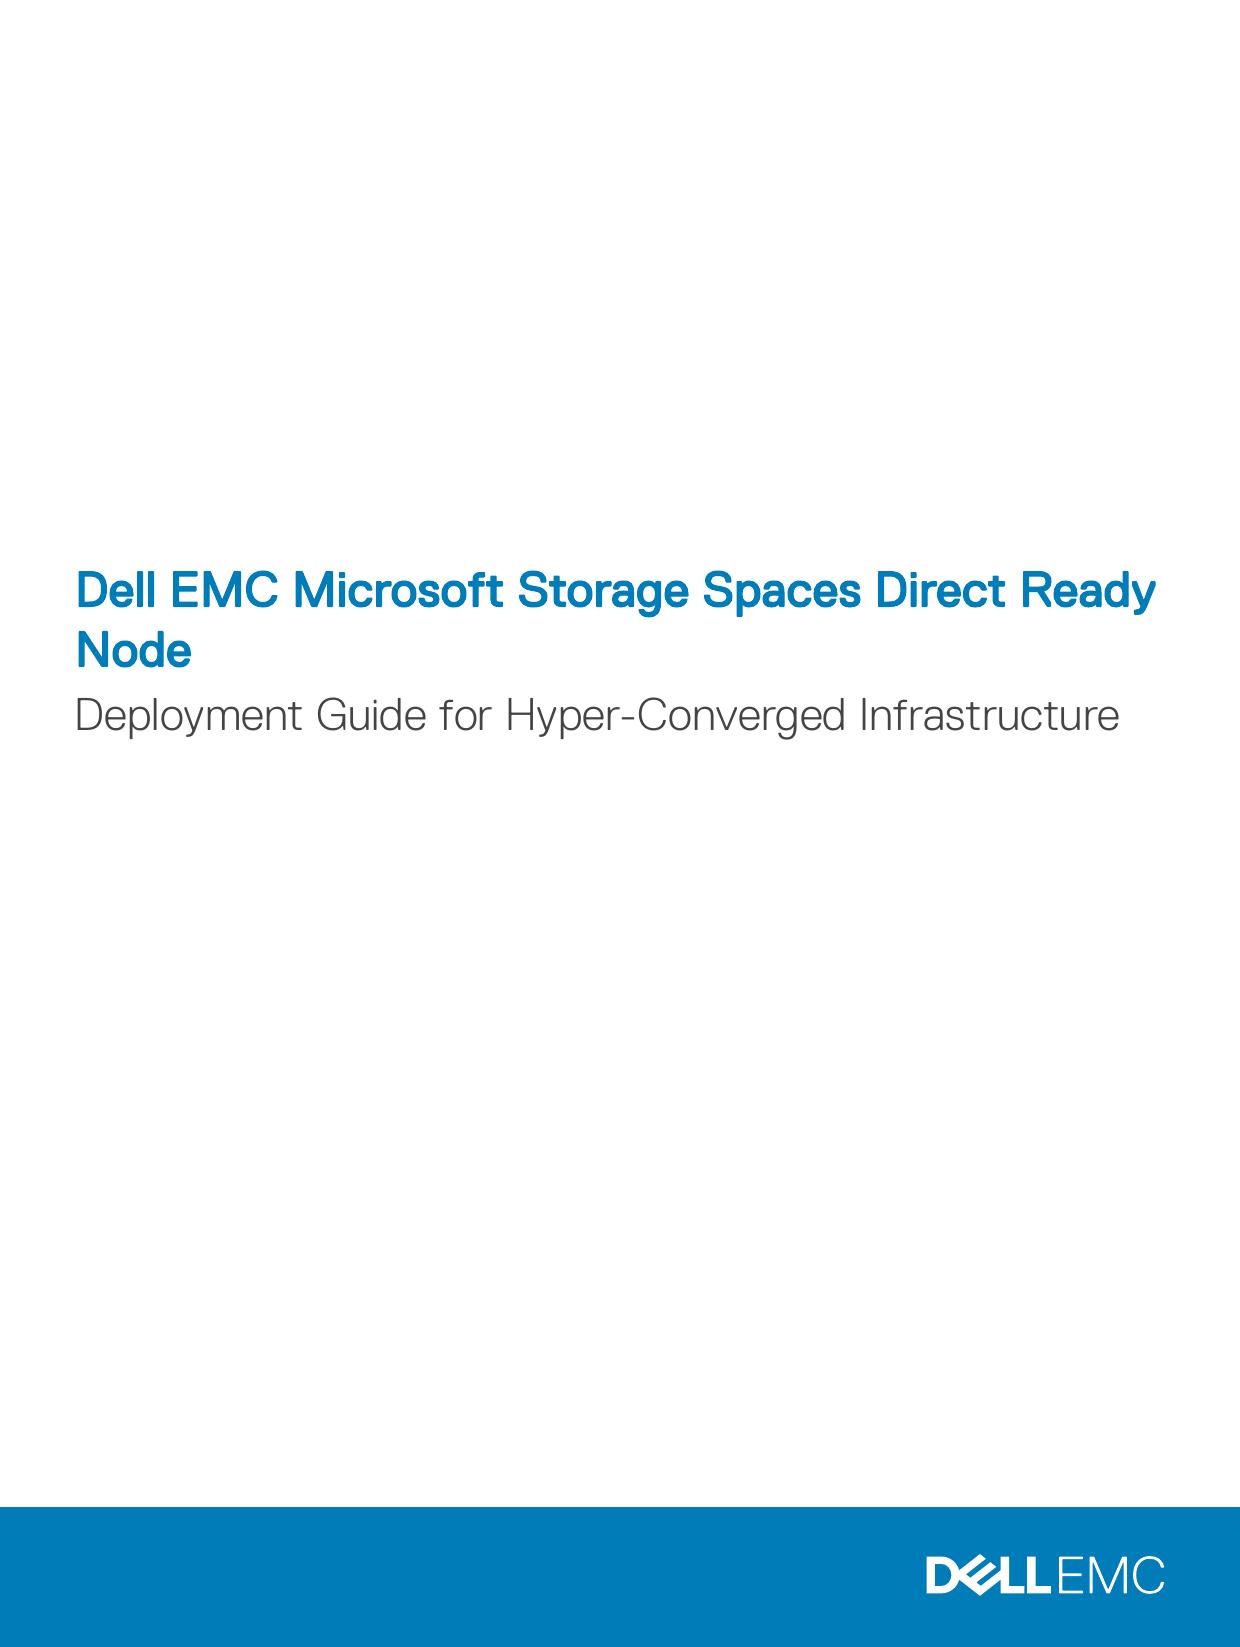 Dell EMC Microsoft Storage Spaces Direct Ready | manualzz com